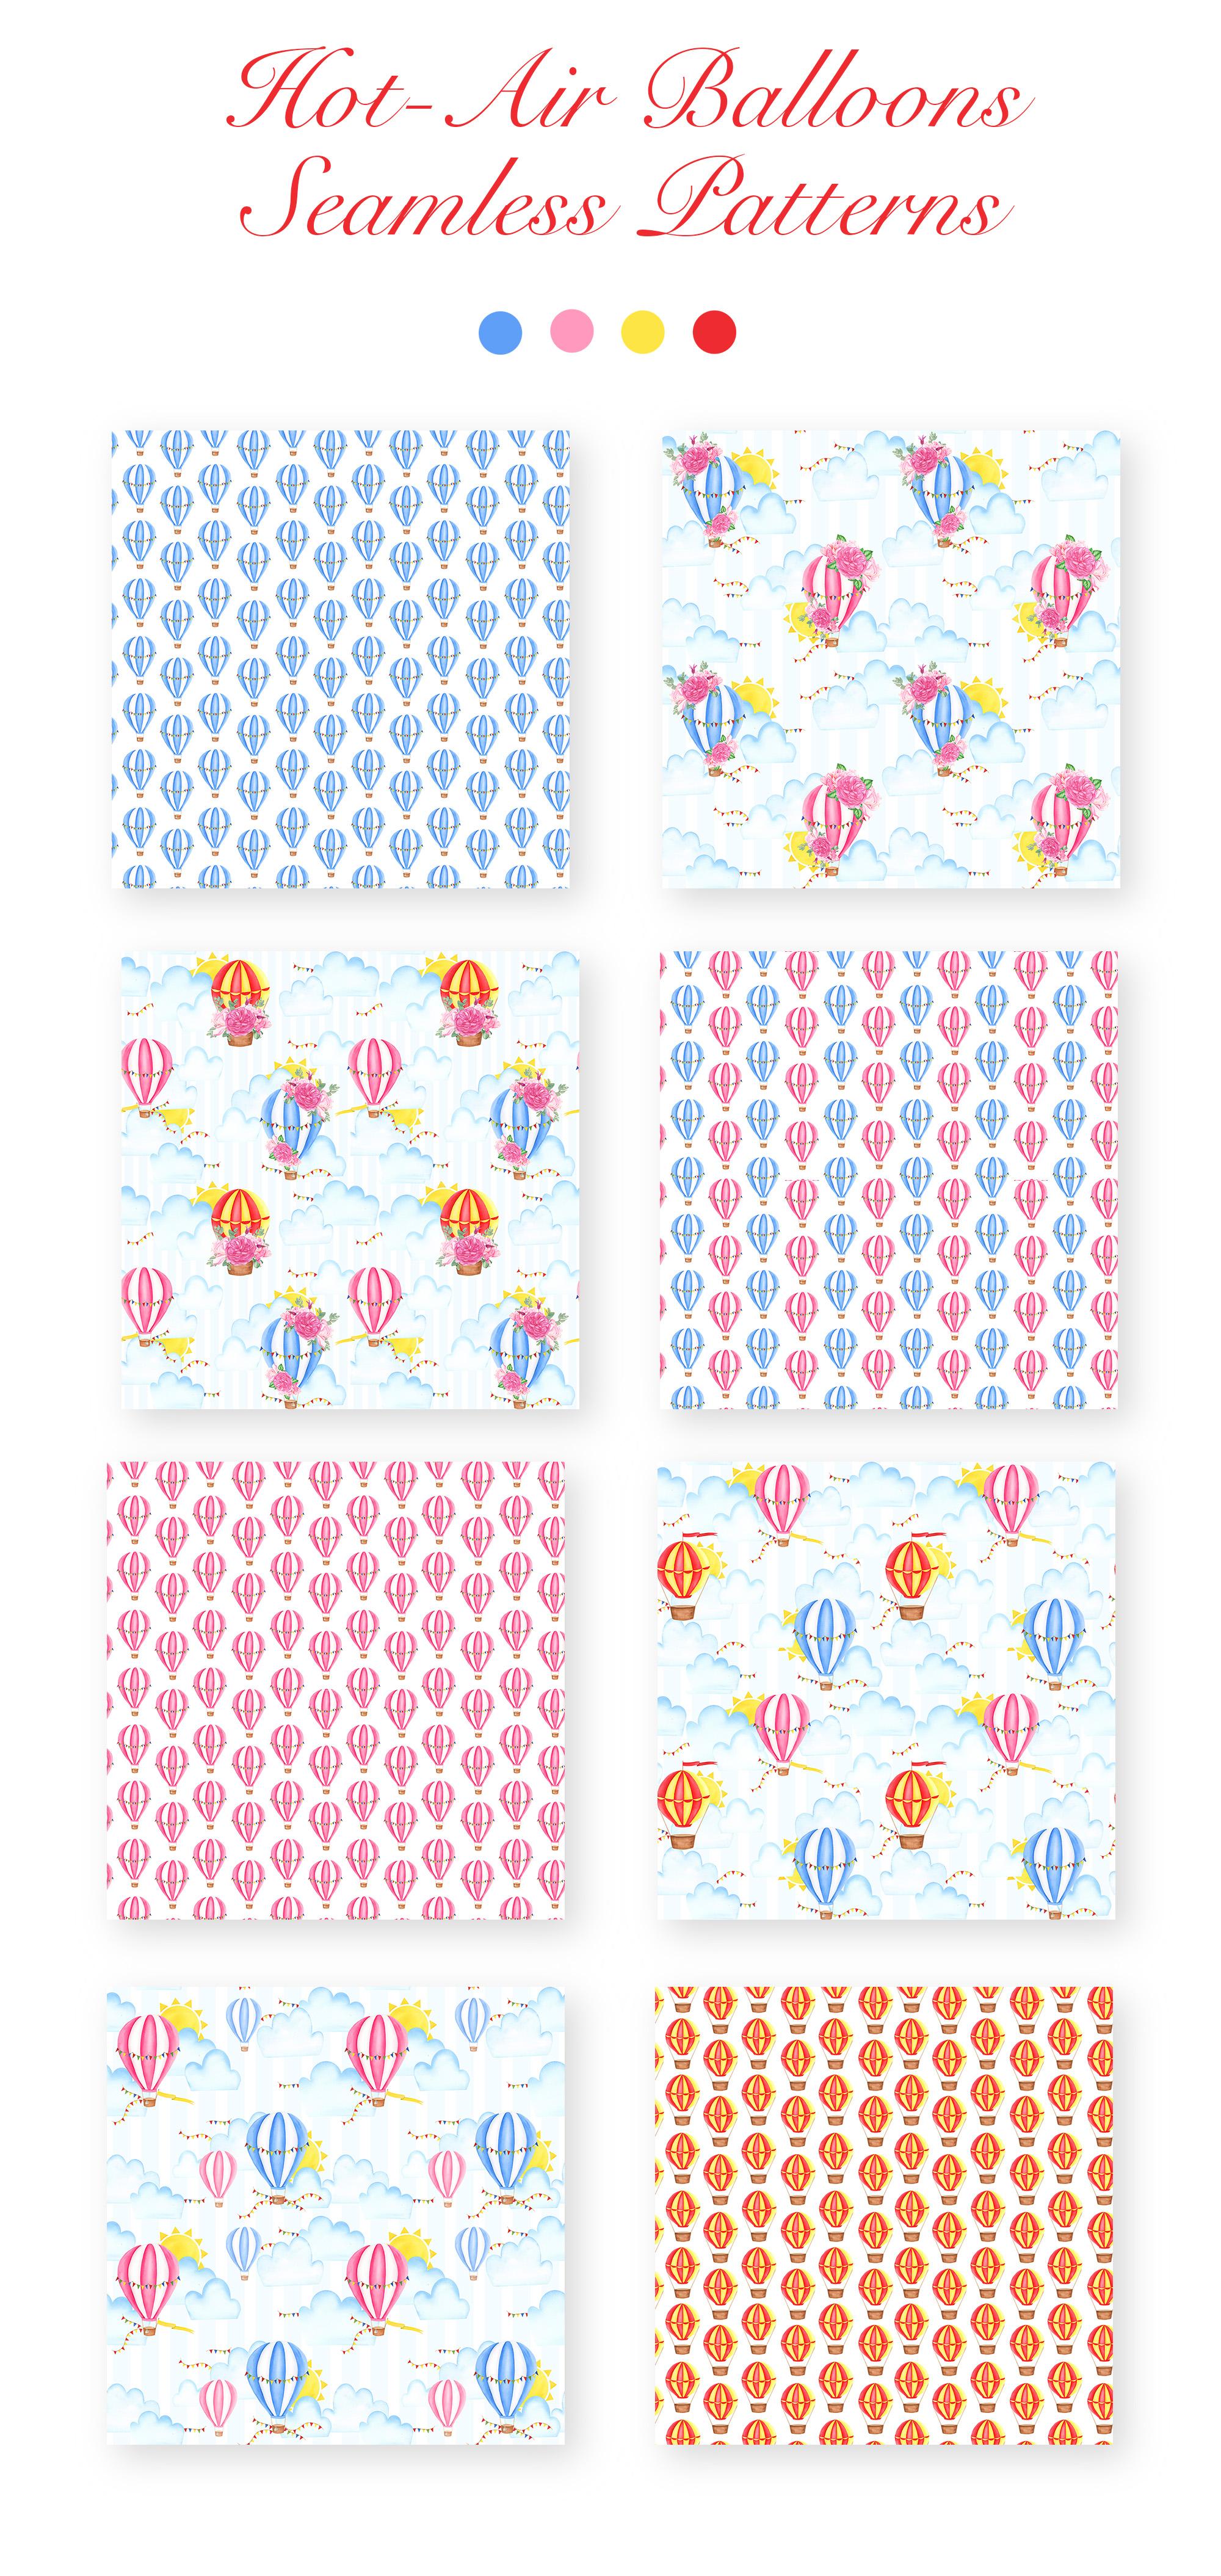 Watercolor Hot-Air Balloons Patterns example image 2